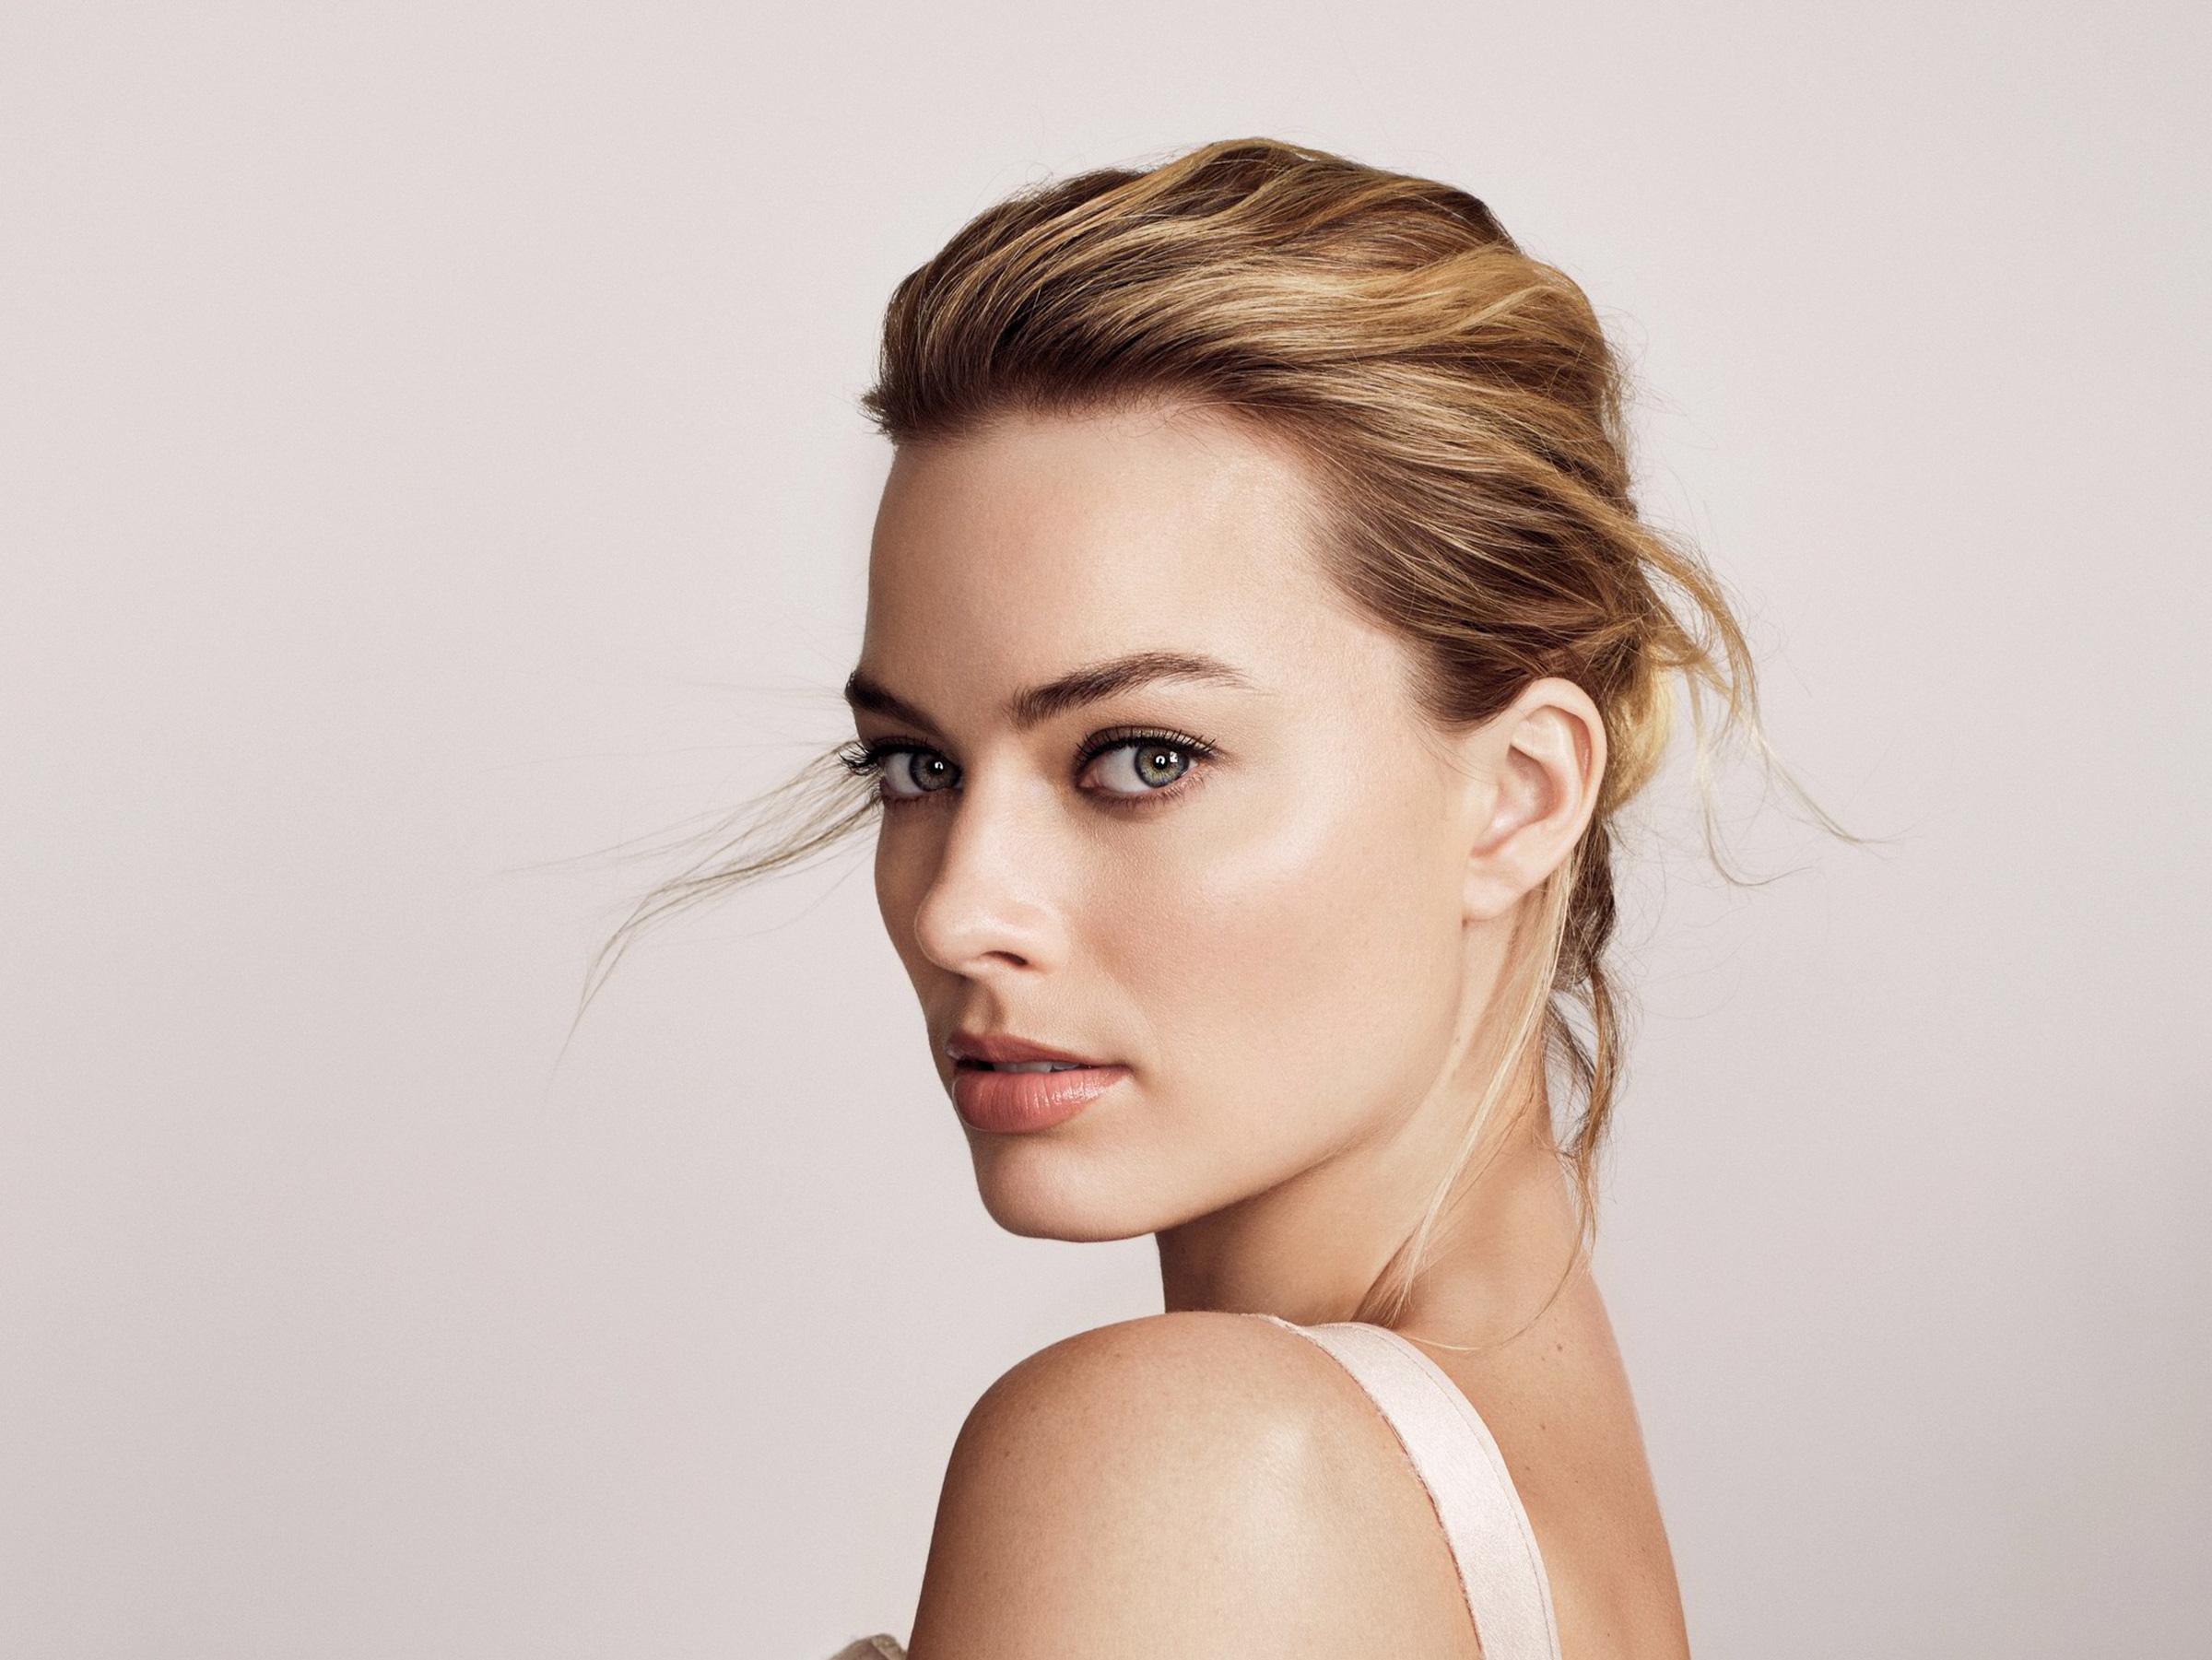 Margot Robbie 2017 Photoshoot, HD Celebrities, 4k